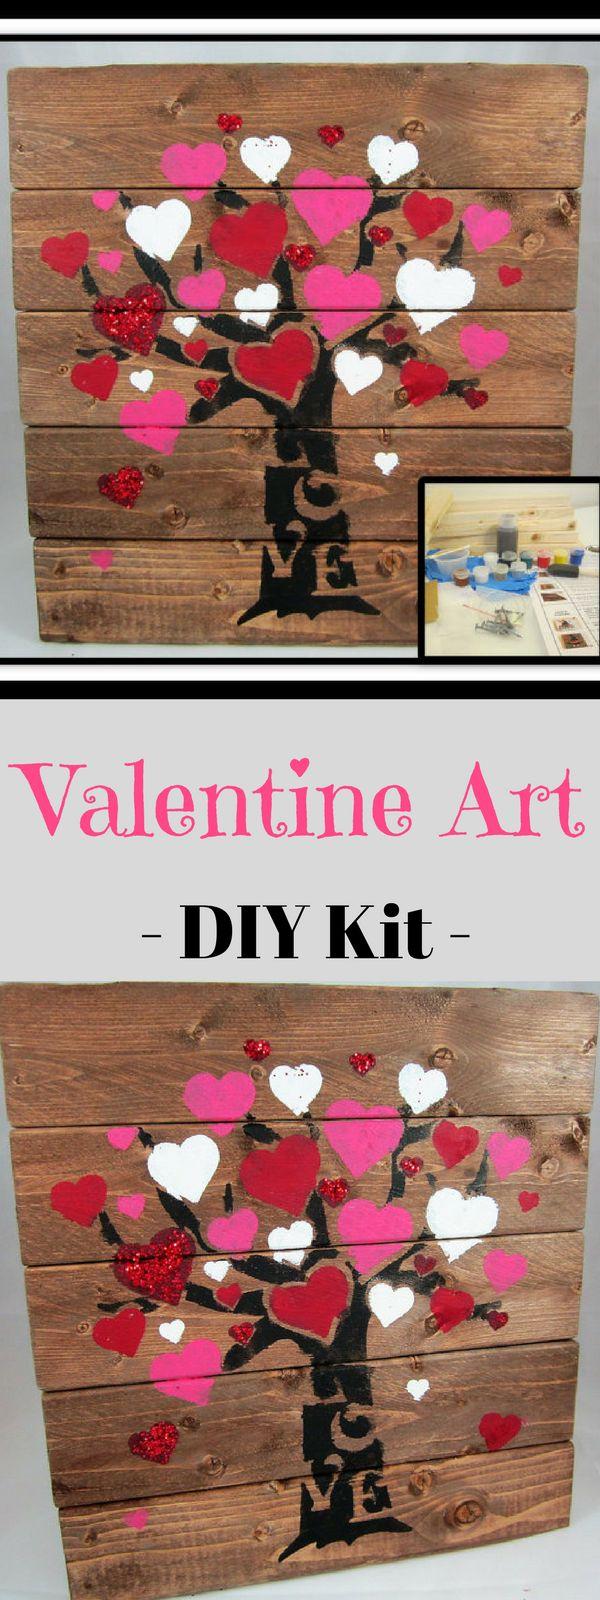 DIY Craft Kit - DIY Valentine Craft - Love Tree Board Sign Craft Kit - Make your own Wood Sign Decoration: Heart Tree - Valentines #ad #gift #craft #DIY #valentine #de cor #love